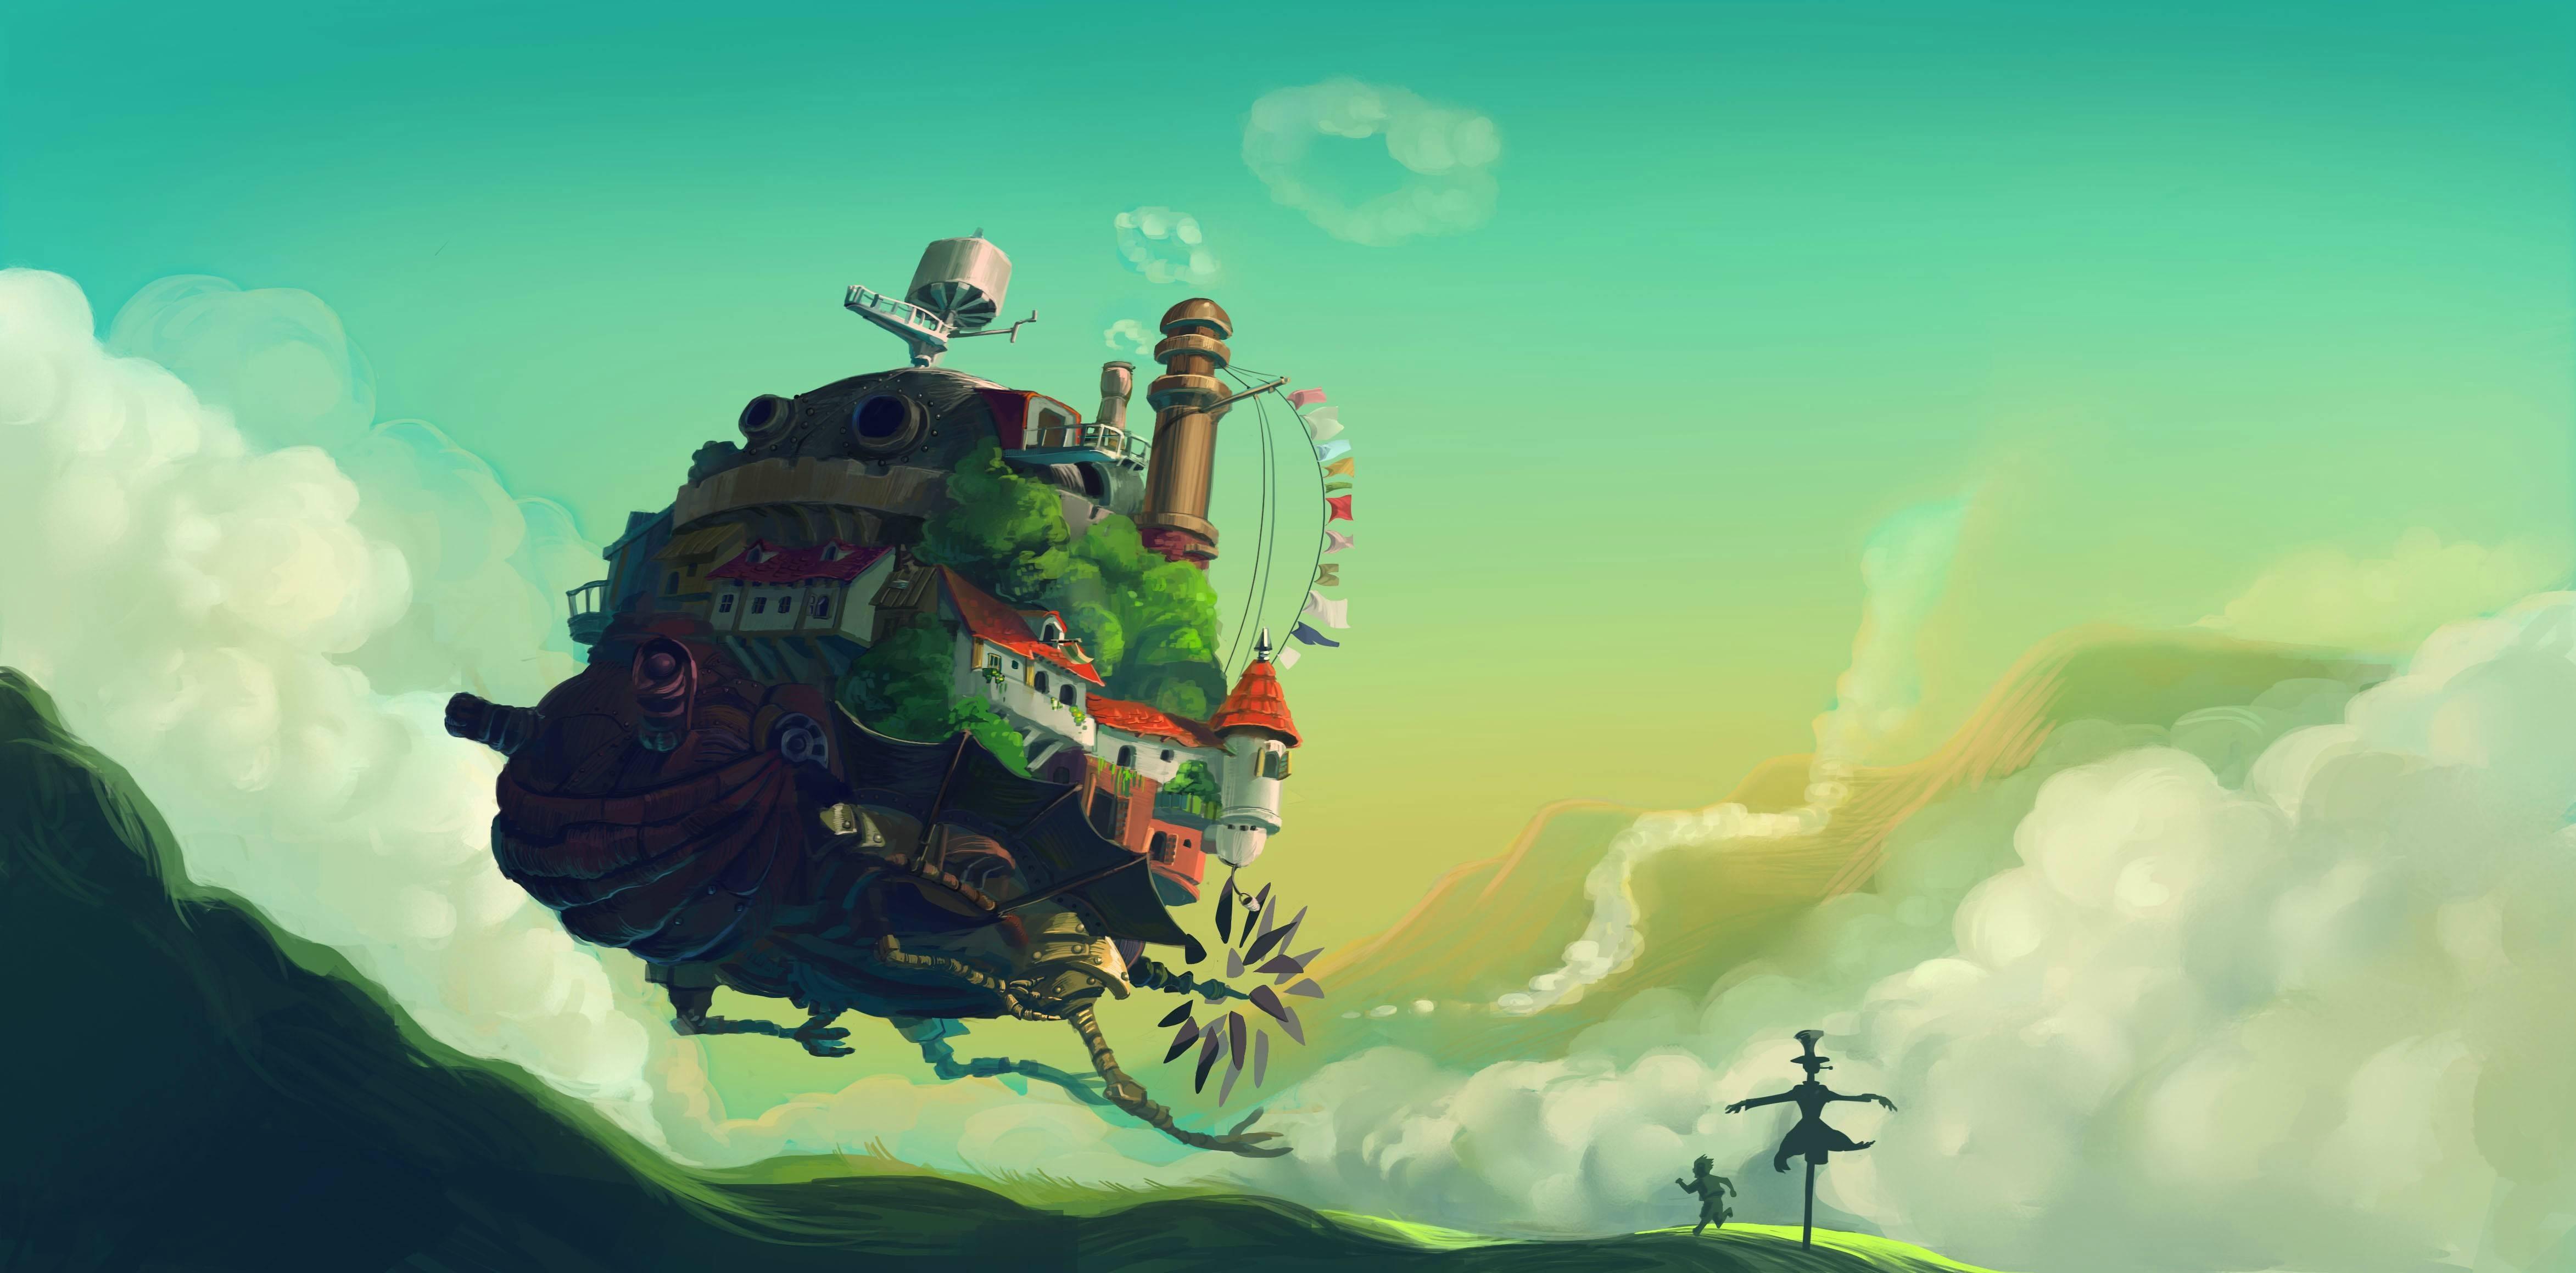 Wallpaper Ilustrasi Anime Studio Ghibli Howl Moving Castle